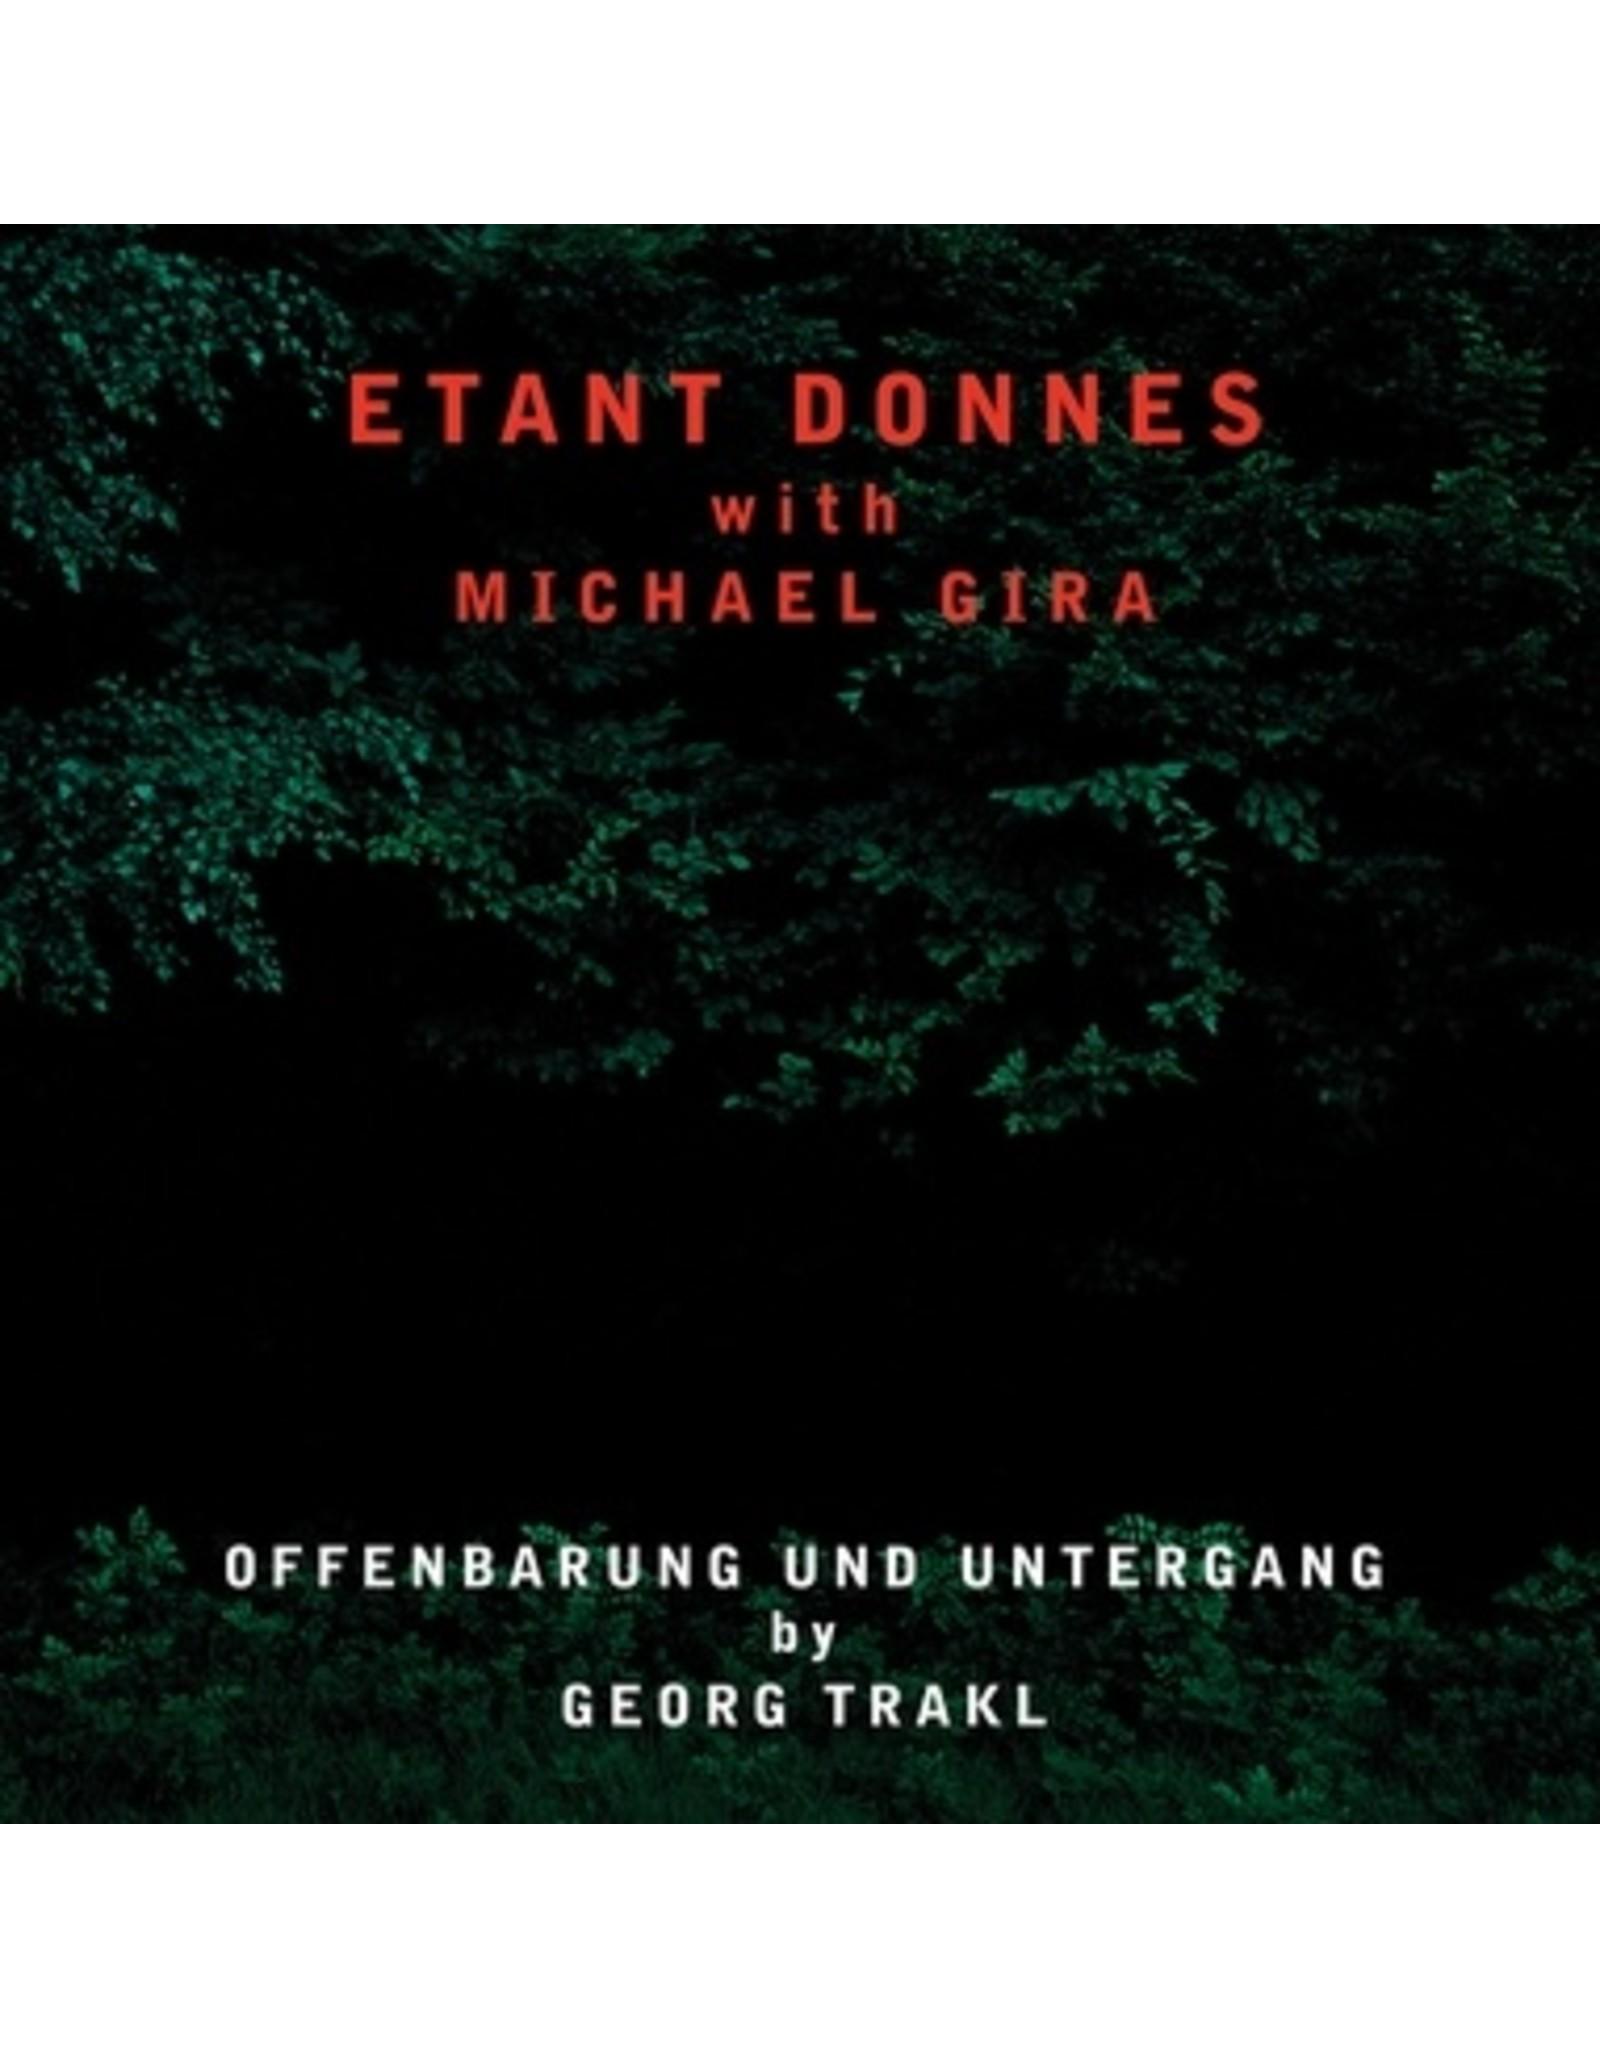 New Vinyl Etant Donnes With Michael Gira - Offenbarung Und Untergang LP